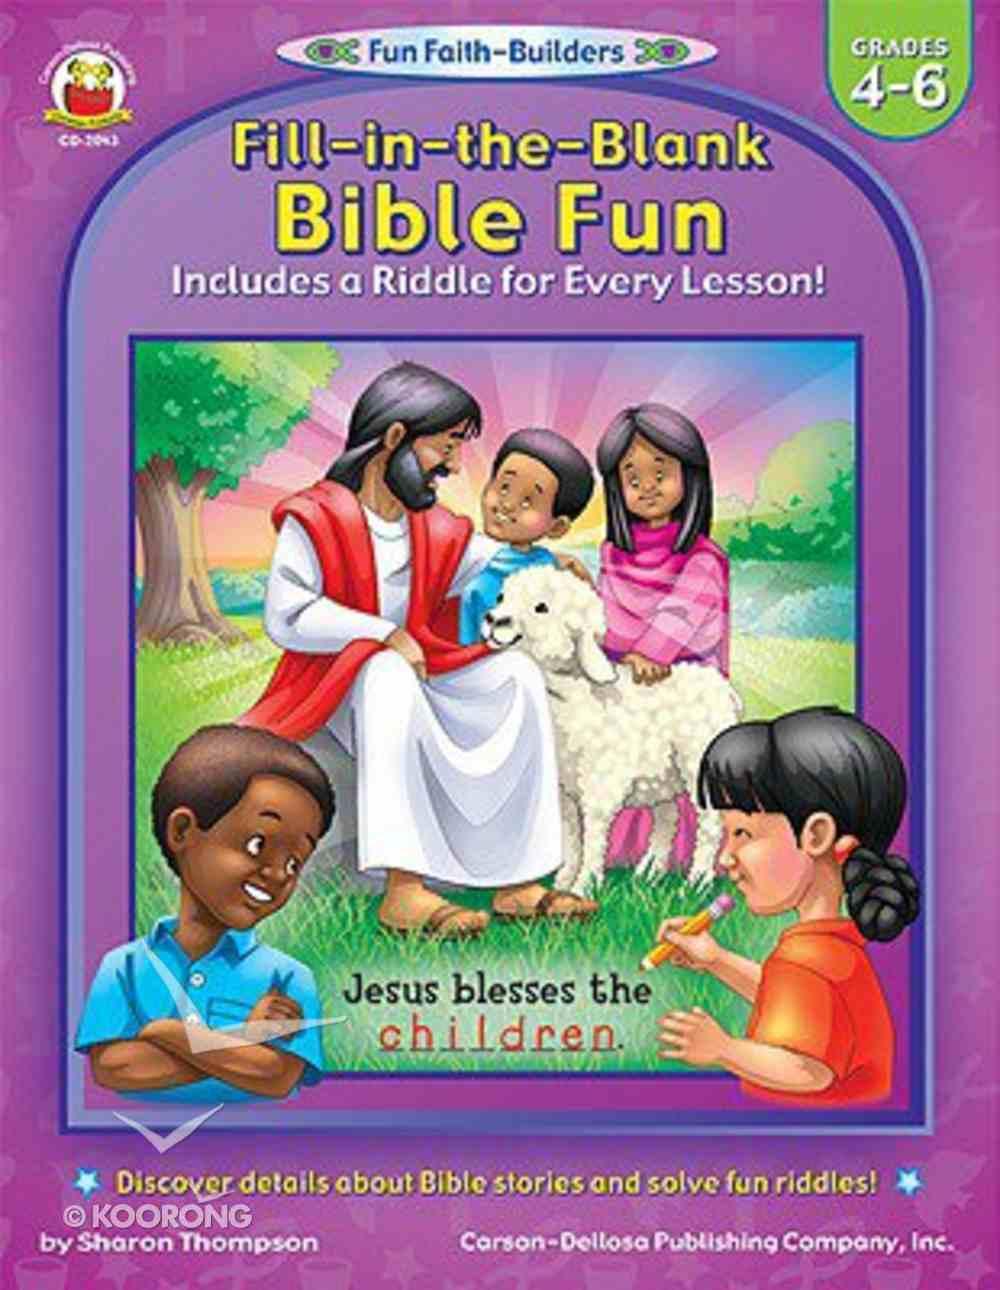 Fill in the Blank Bible Fun (Grades 4-6) (Fun Faith-builders Series) Paperback